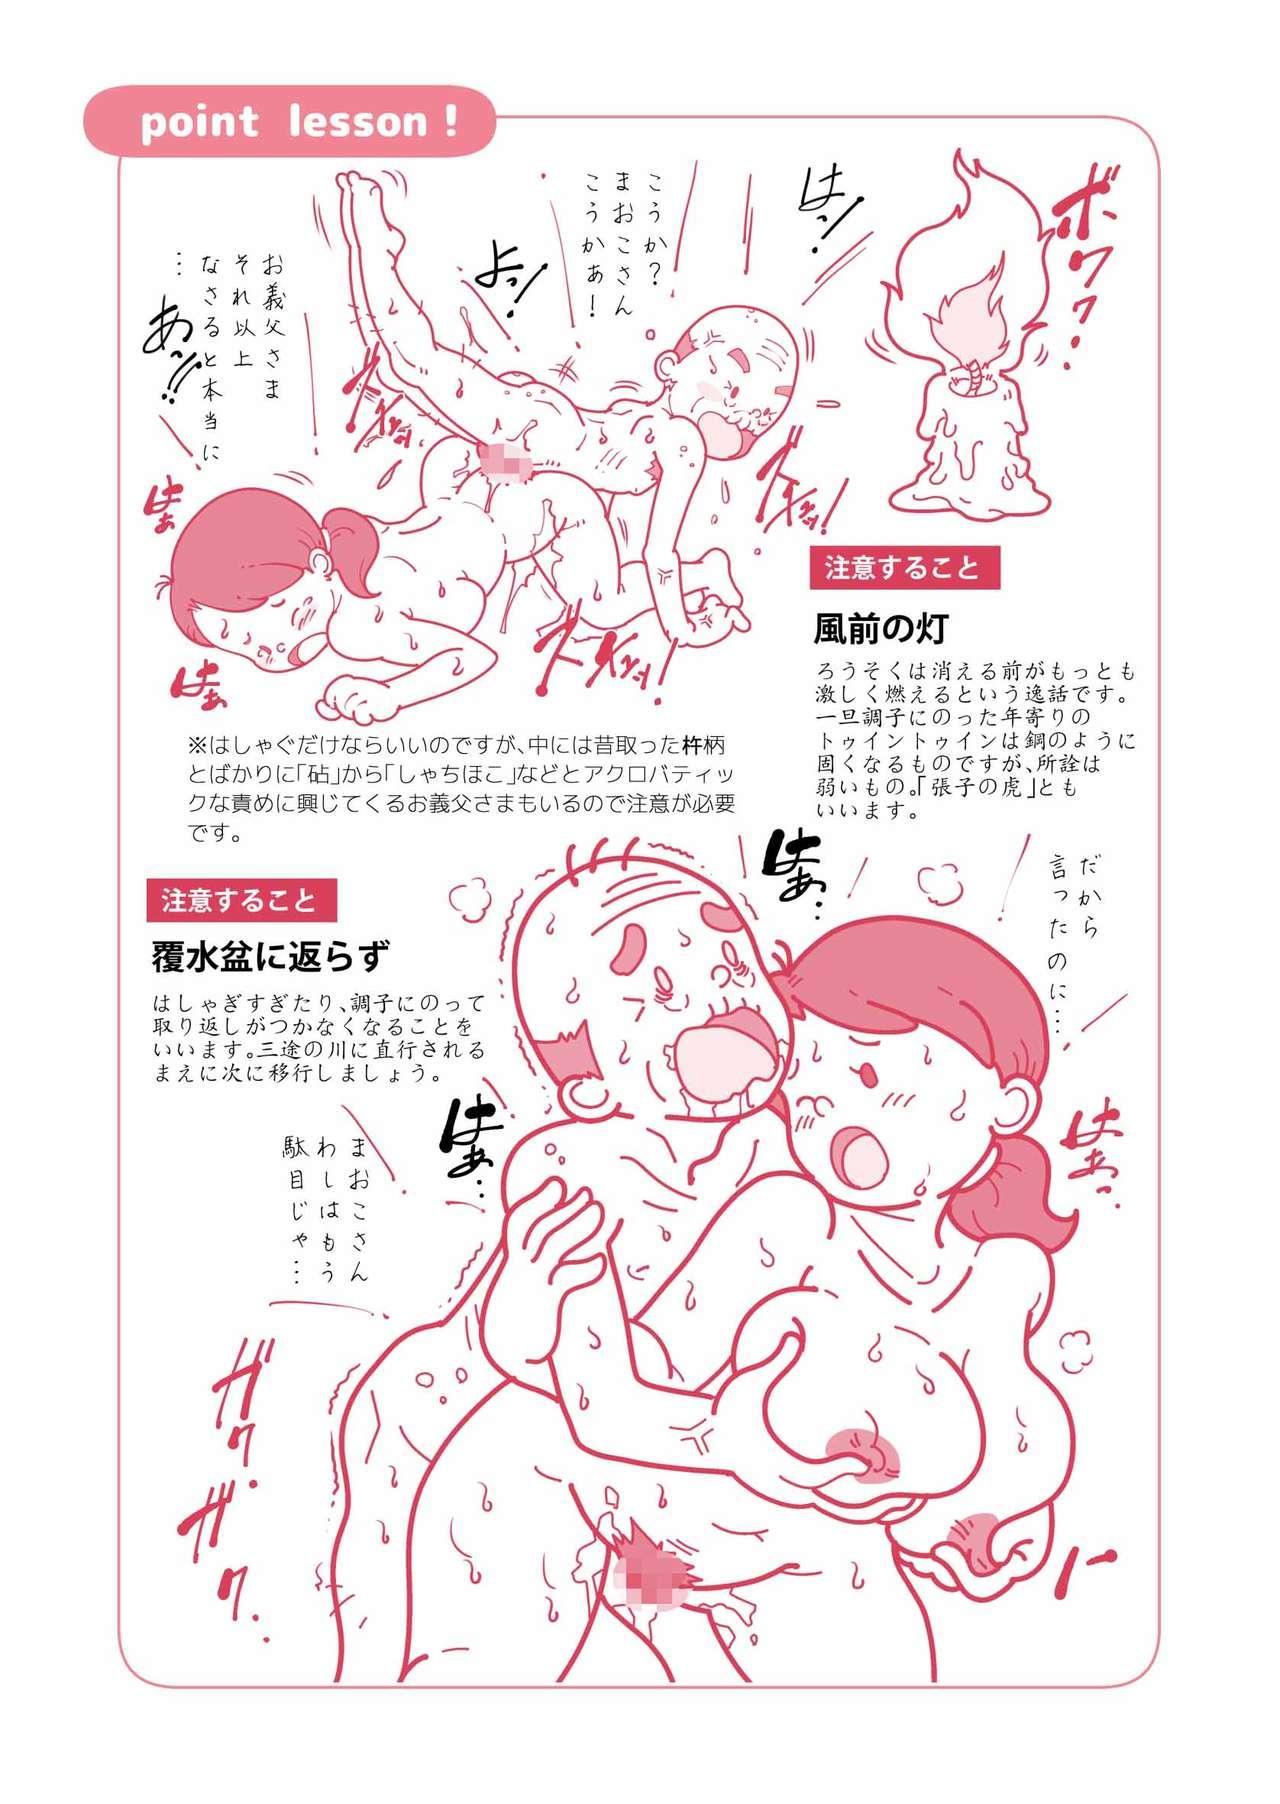 Isogasii Okaasan No Tamuno Sasa Rouzin Seikaigo | Guide for Elderly Sex Health Care to Busy Mom 60